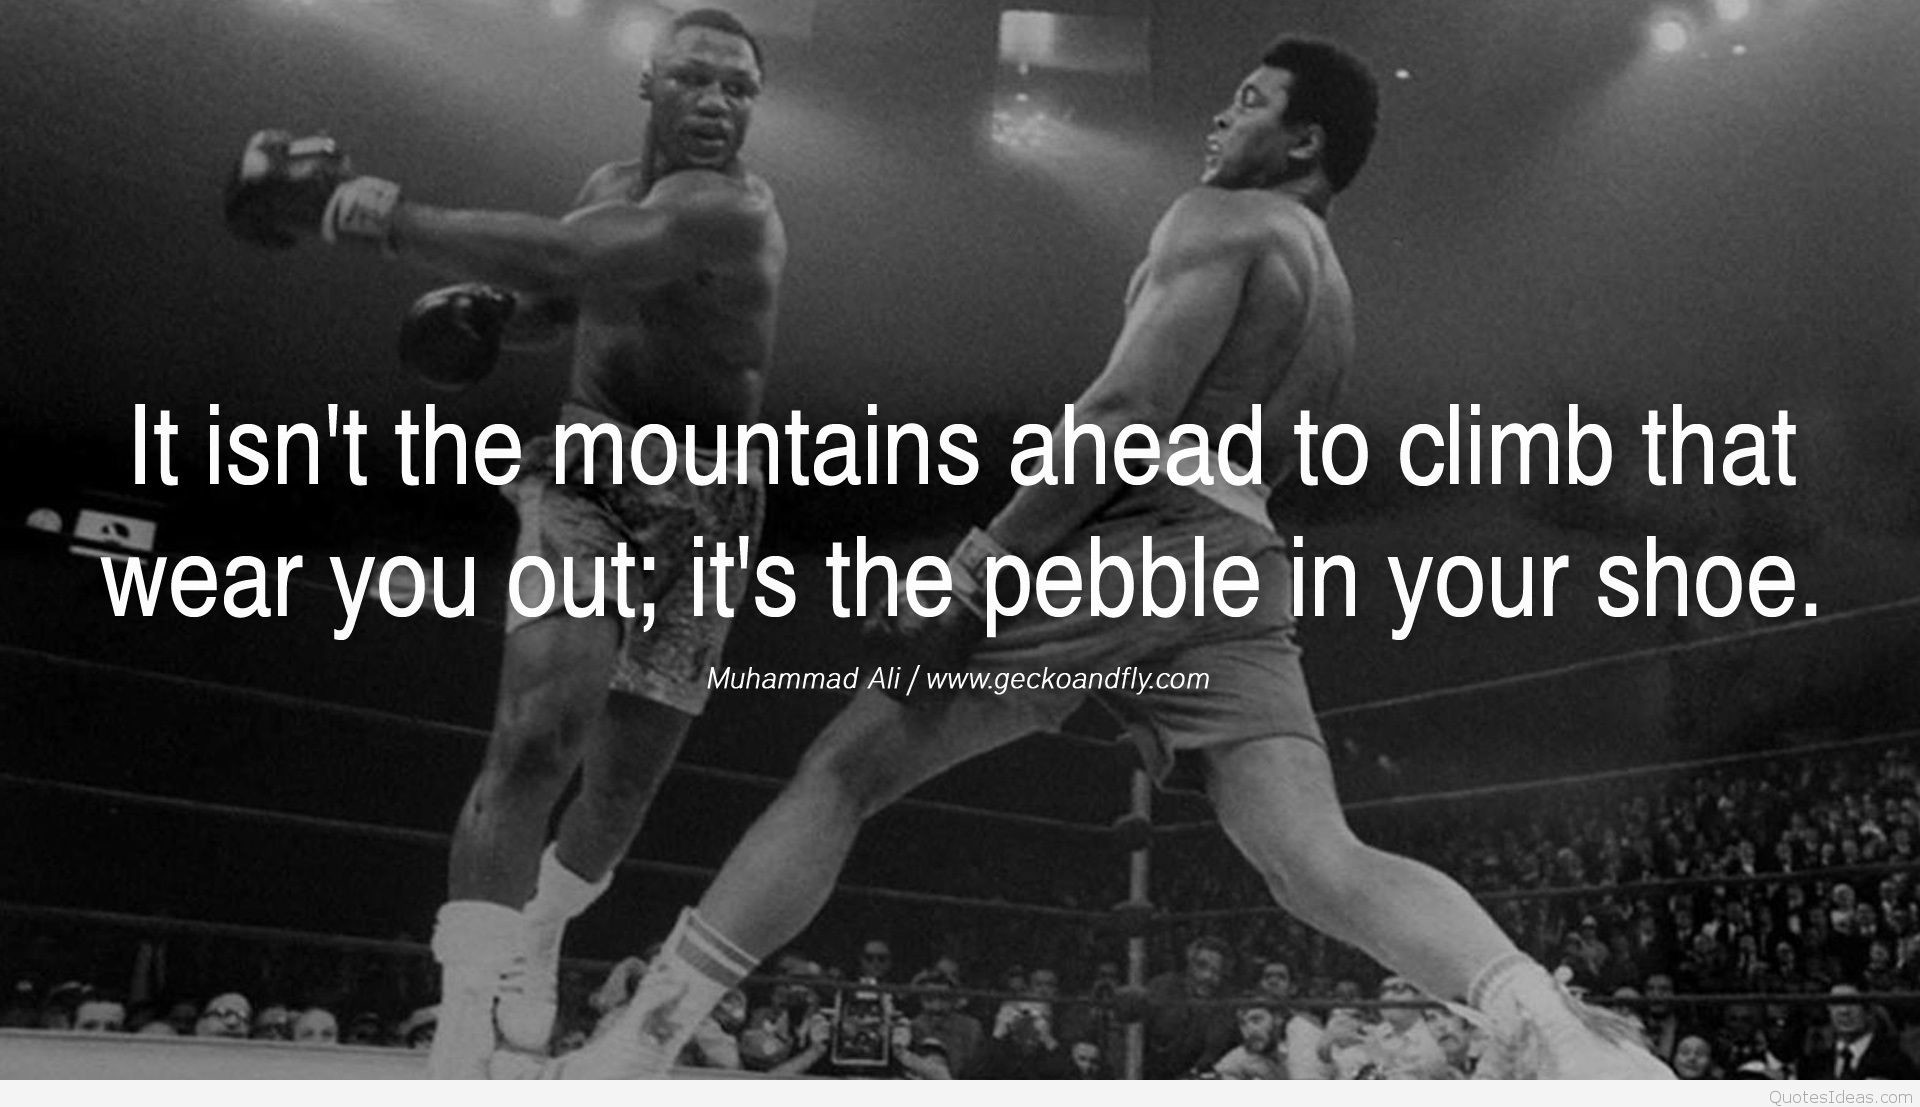 Muhammad Ali Quotes Wallpaper (79+ images)